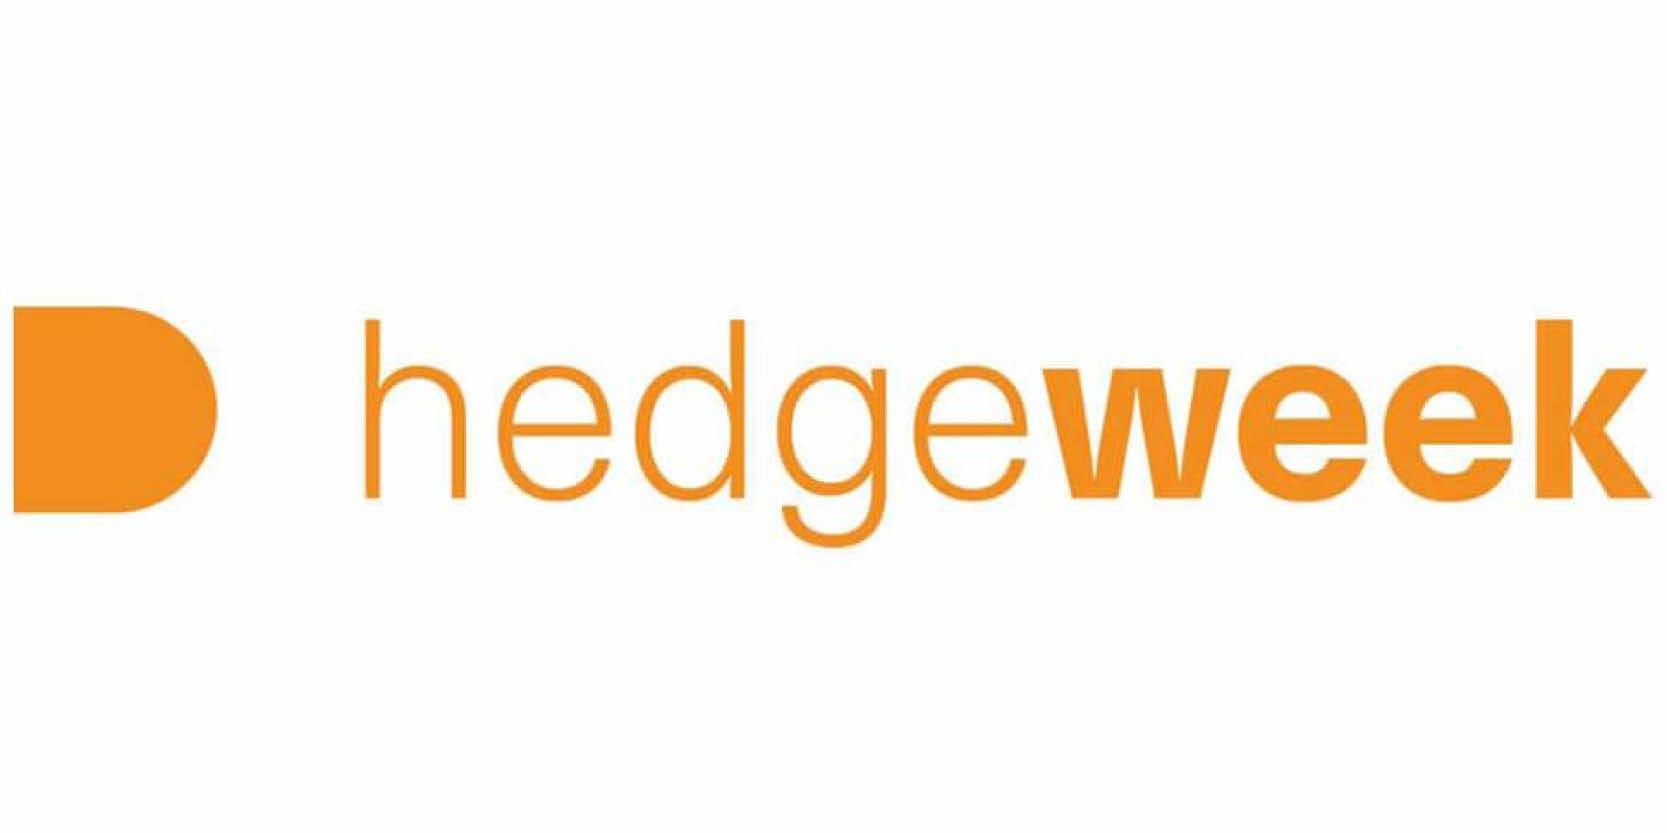 HedgeWeek: How to Protect One's Digital Footprint